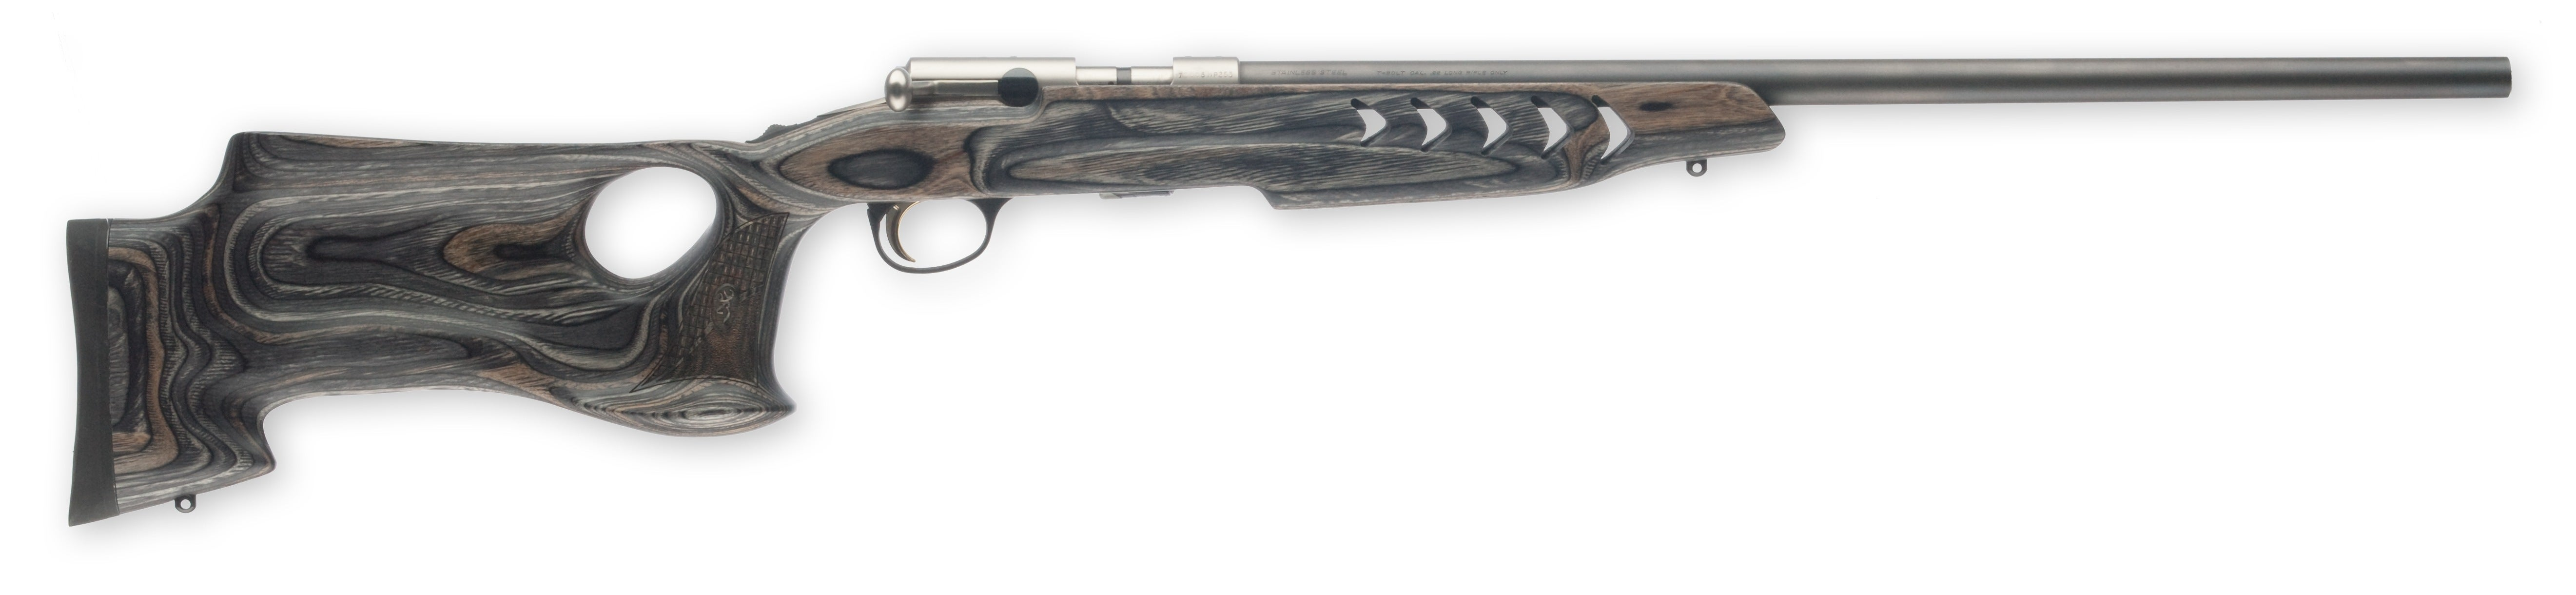 t-bolt target/varmint